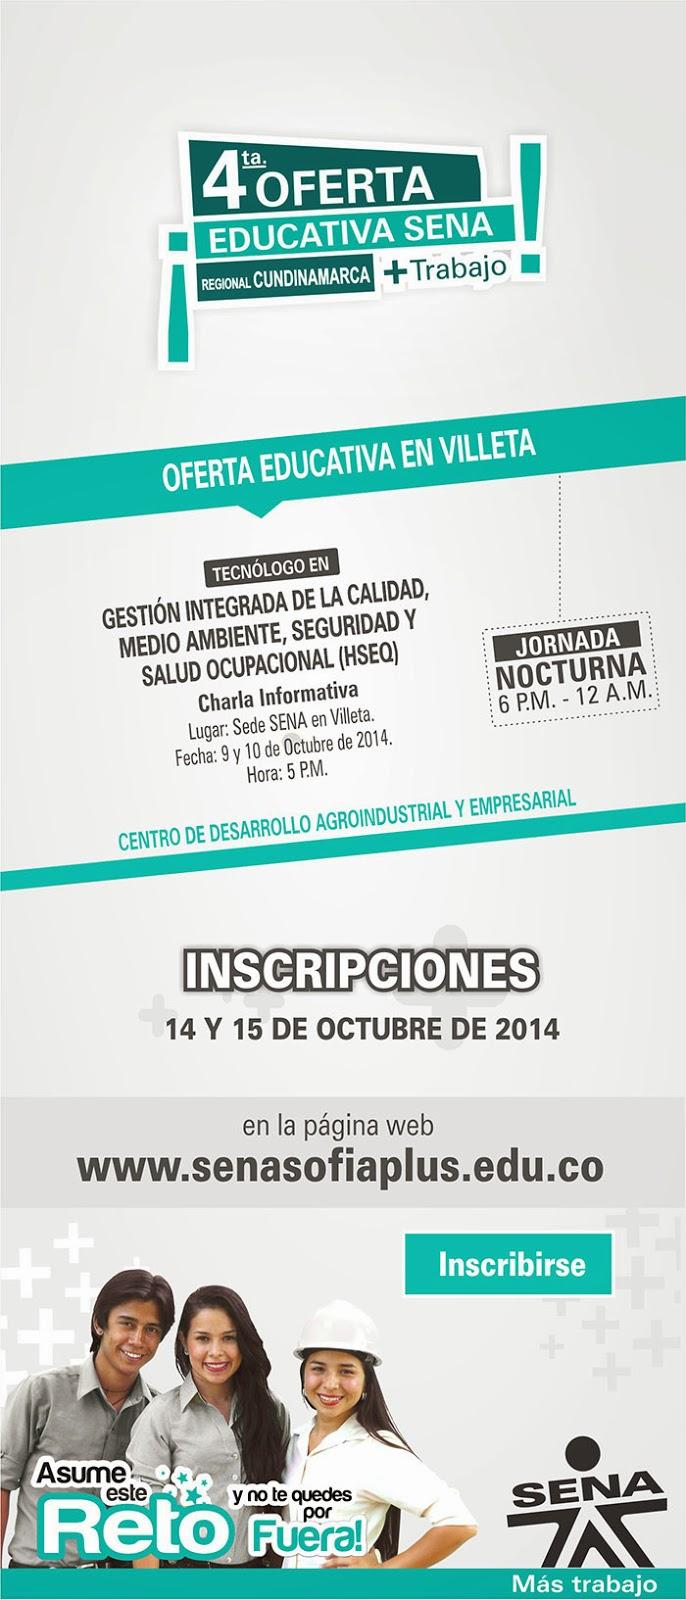 Cuarta oferta educativa extraordinaria SENA 2014